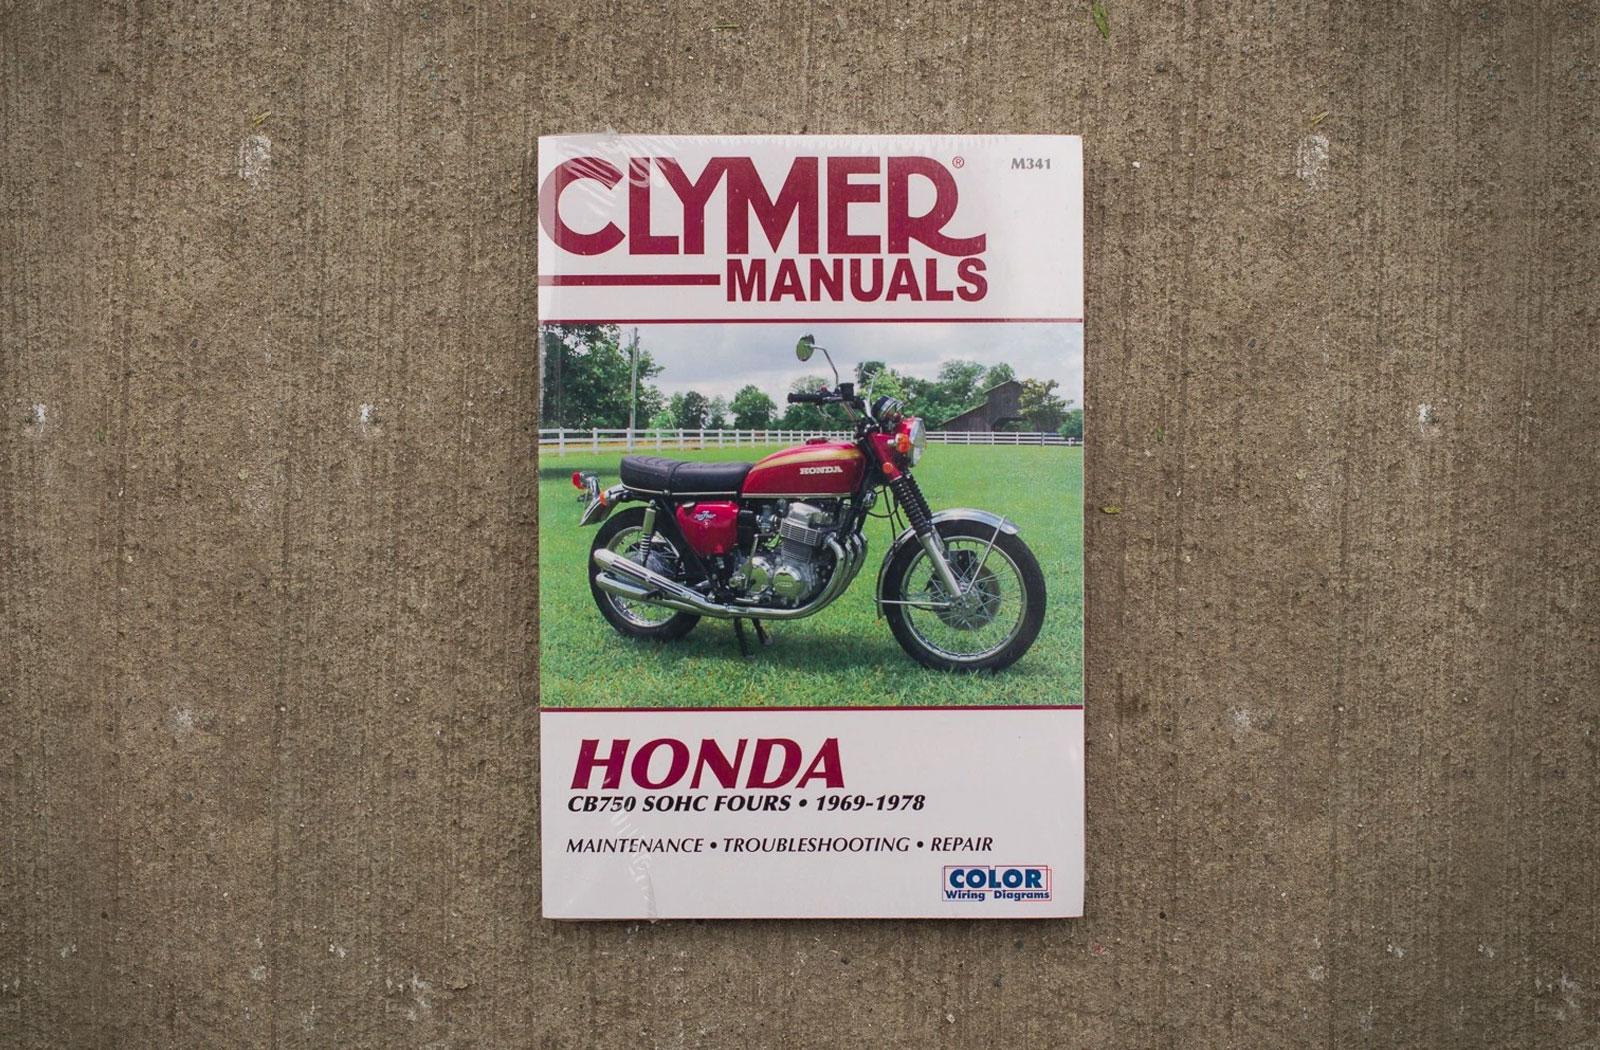 Clymer Manuals Honda CB750 workshop manual